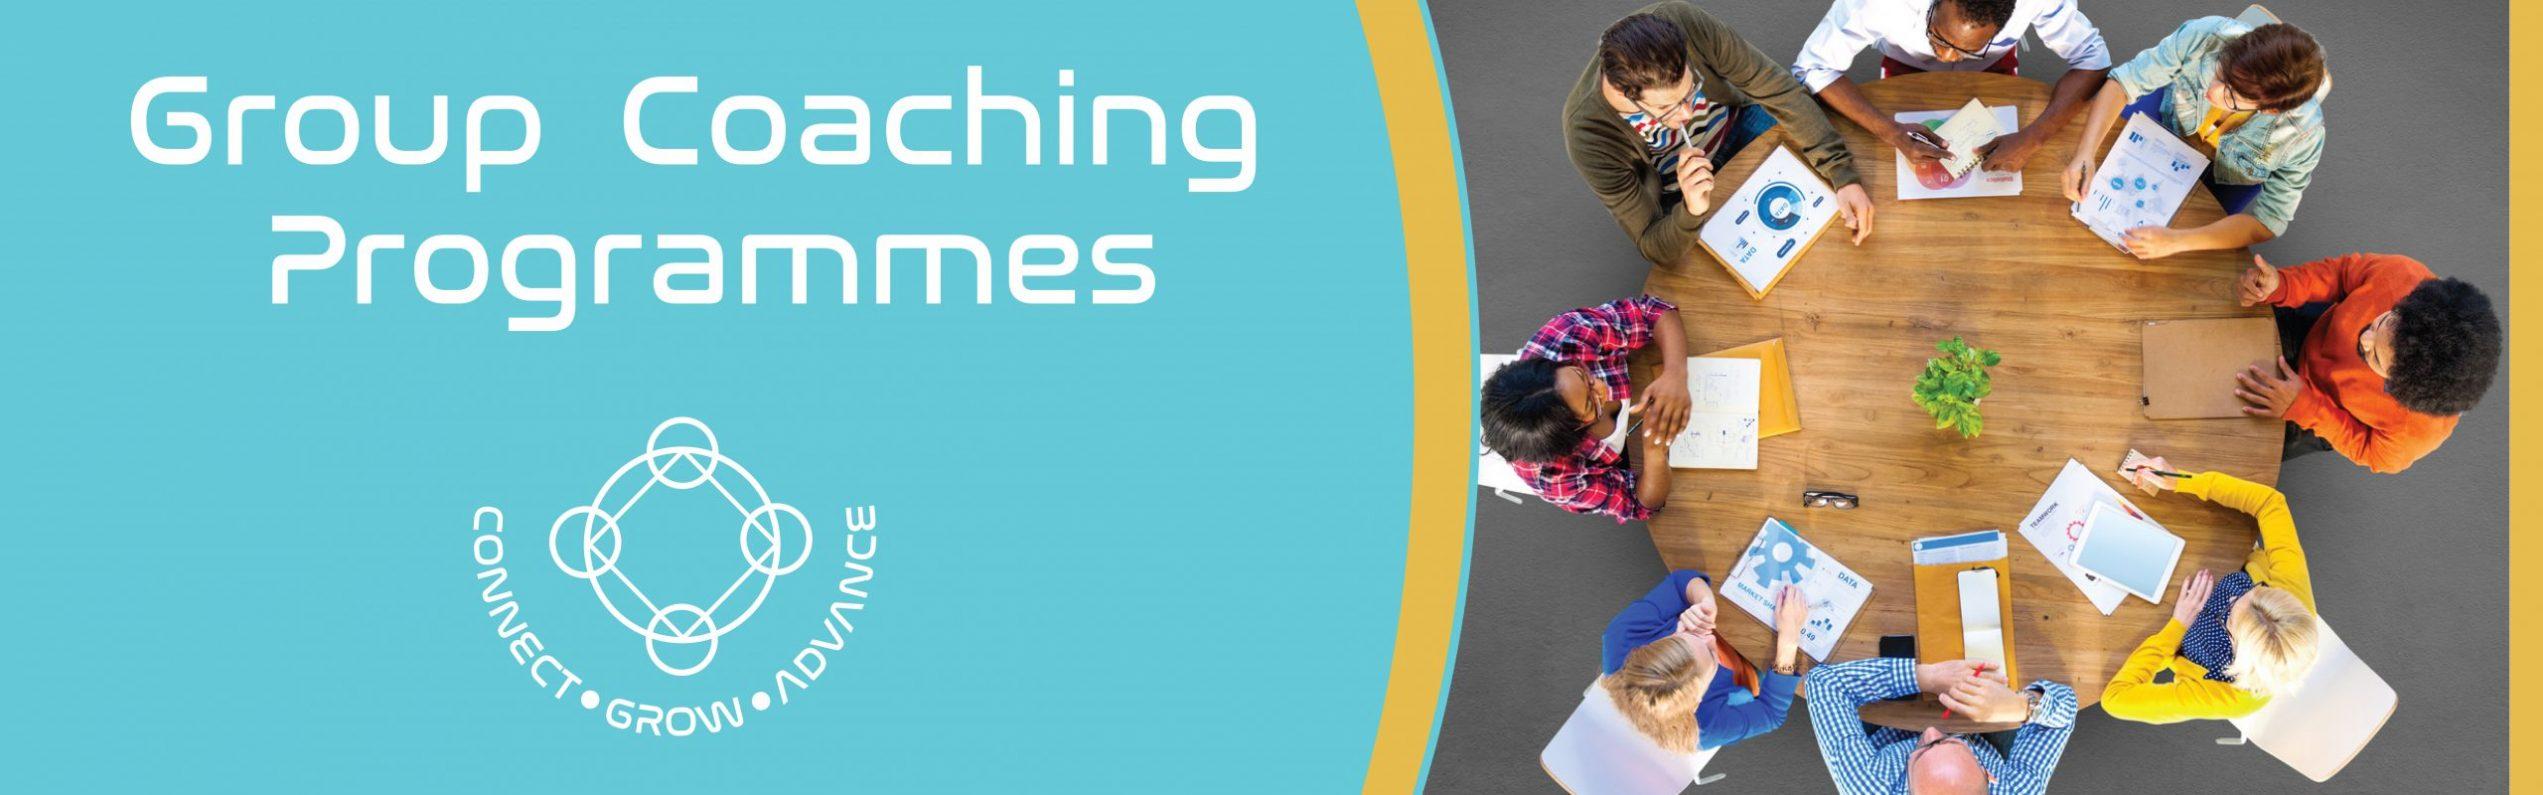 Group Coaching Programmes